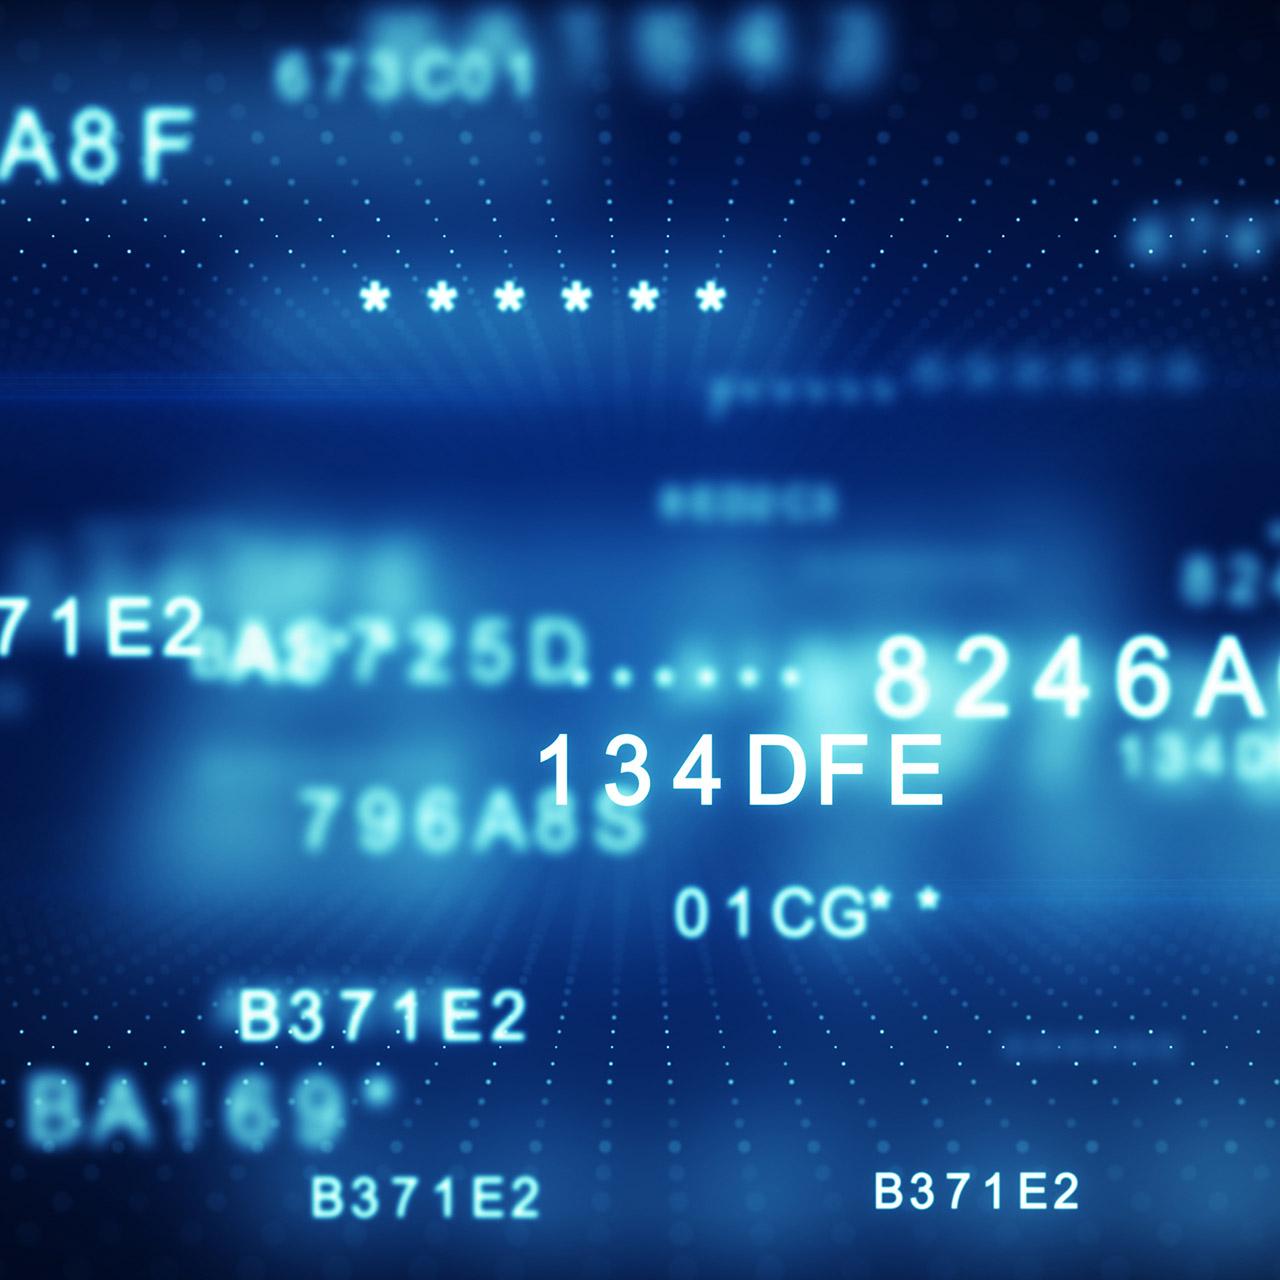 Decryption of blue digital data code